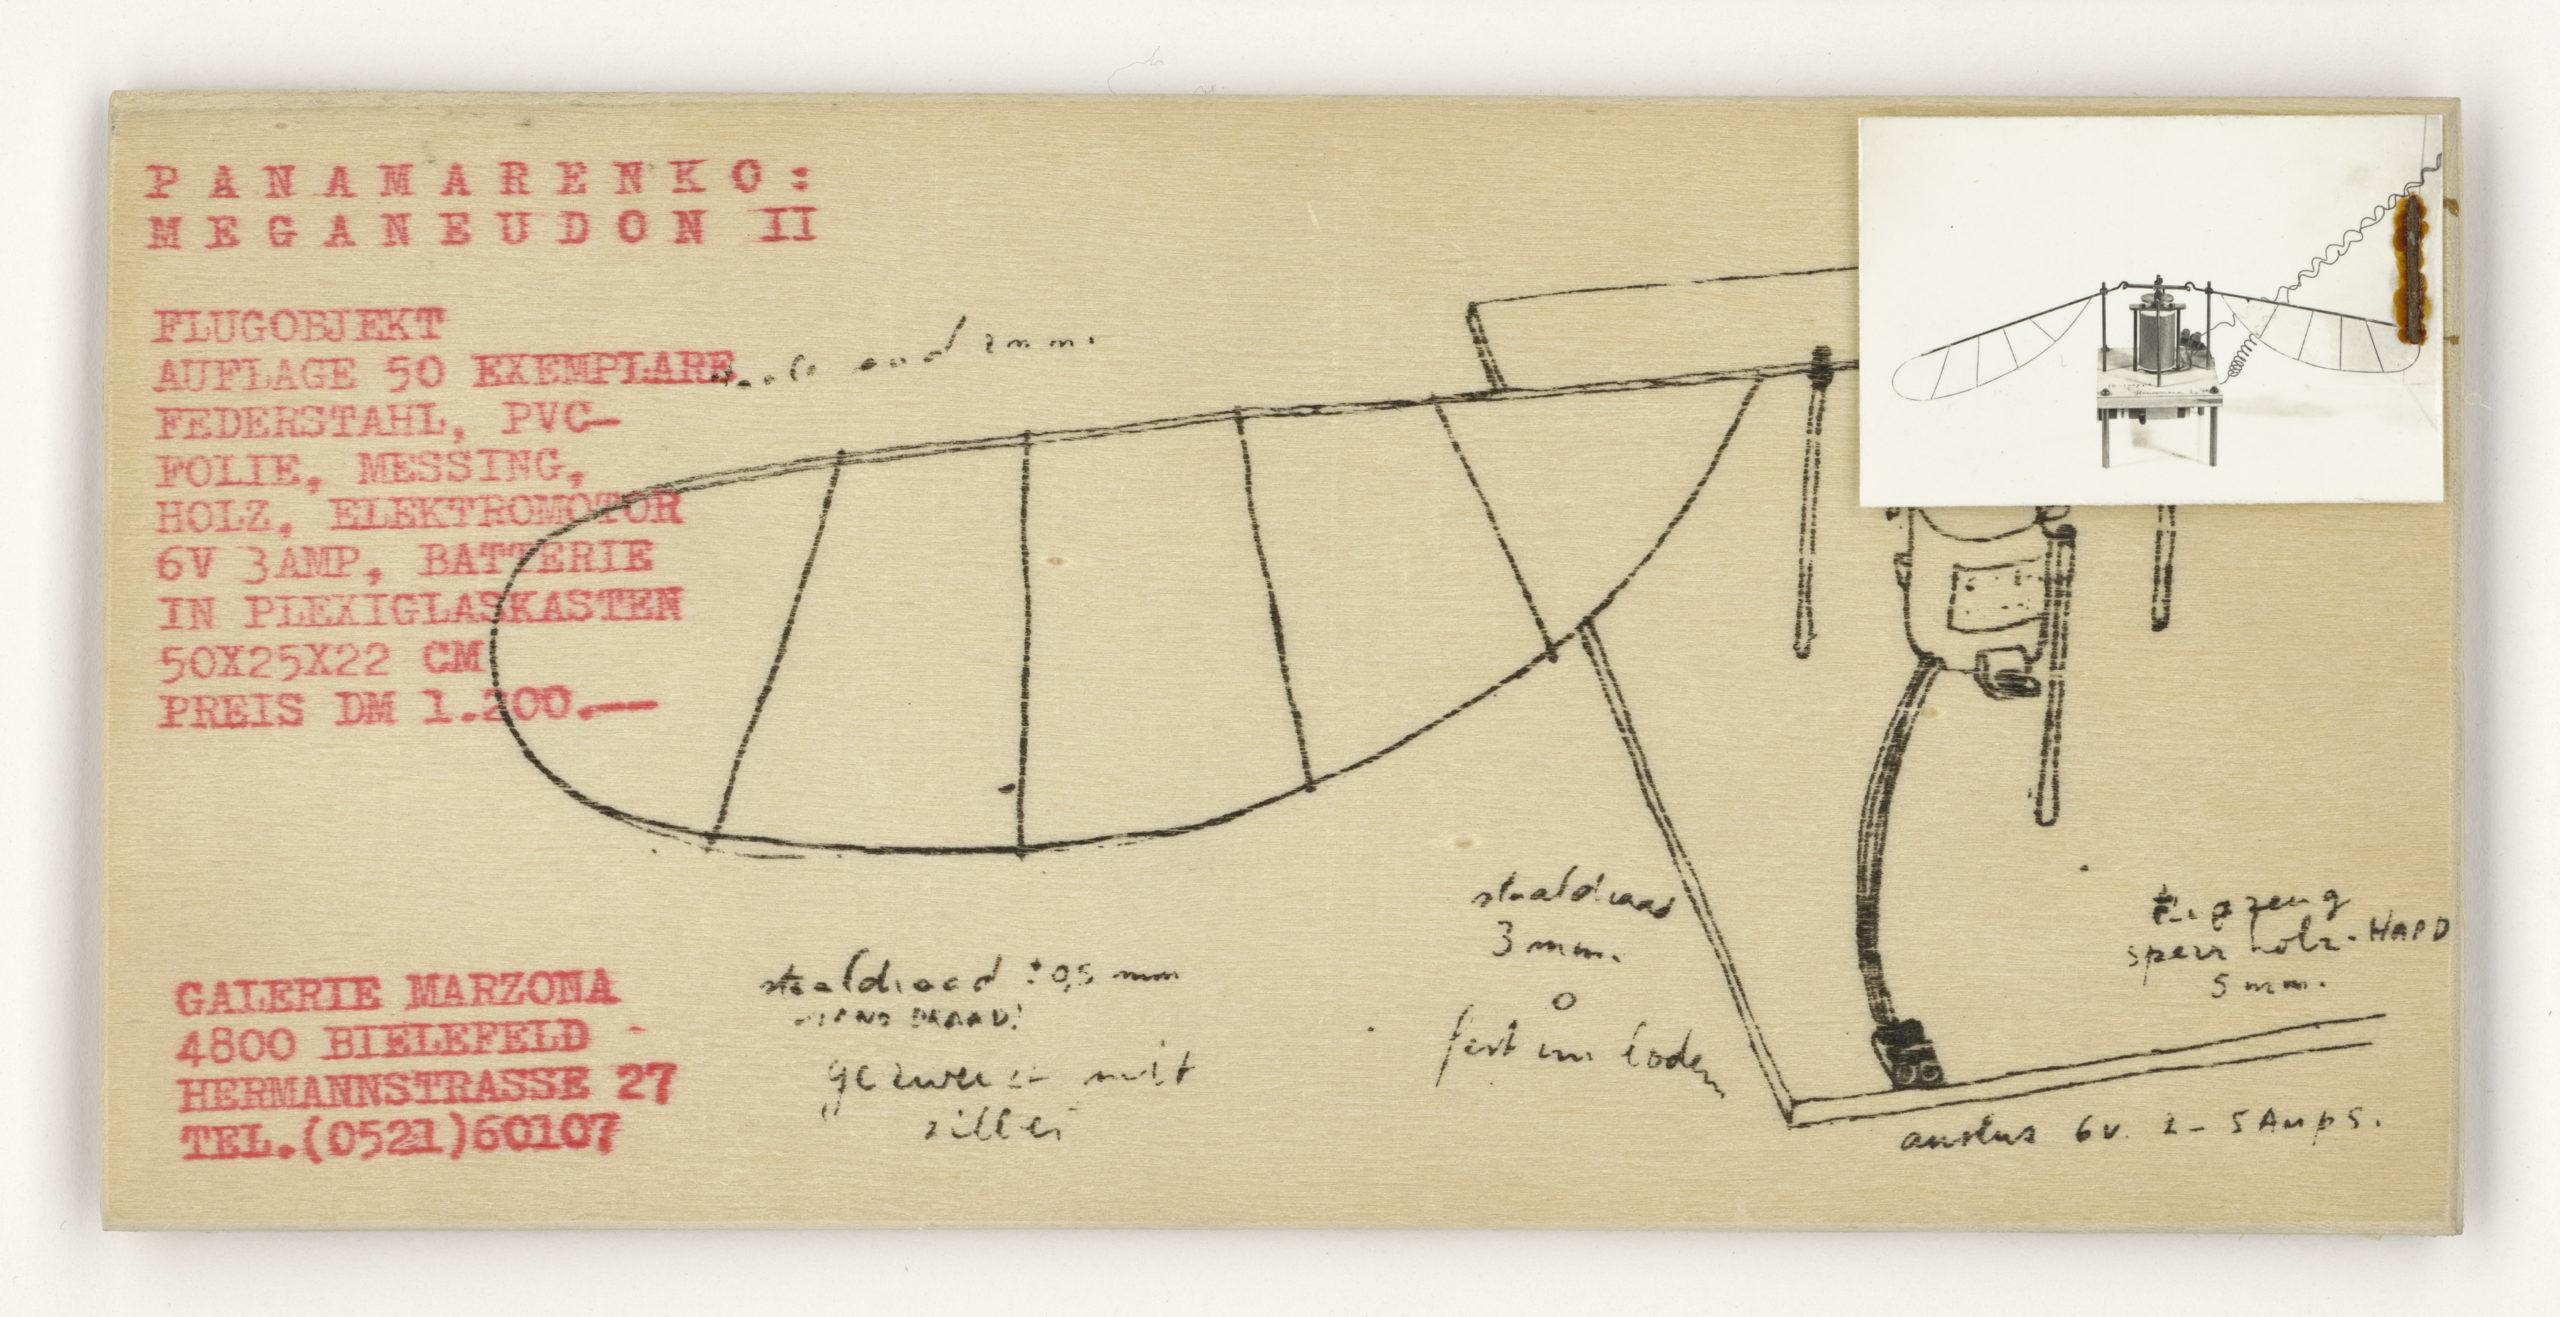 Panamarenko,  Meganeudon II, Galerie Egidio Marzona Bielefeld, 1973 (invitation / Edition); Sammlung Marzona, Kunstbibliothek – Staatliche Museen zu Berlin